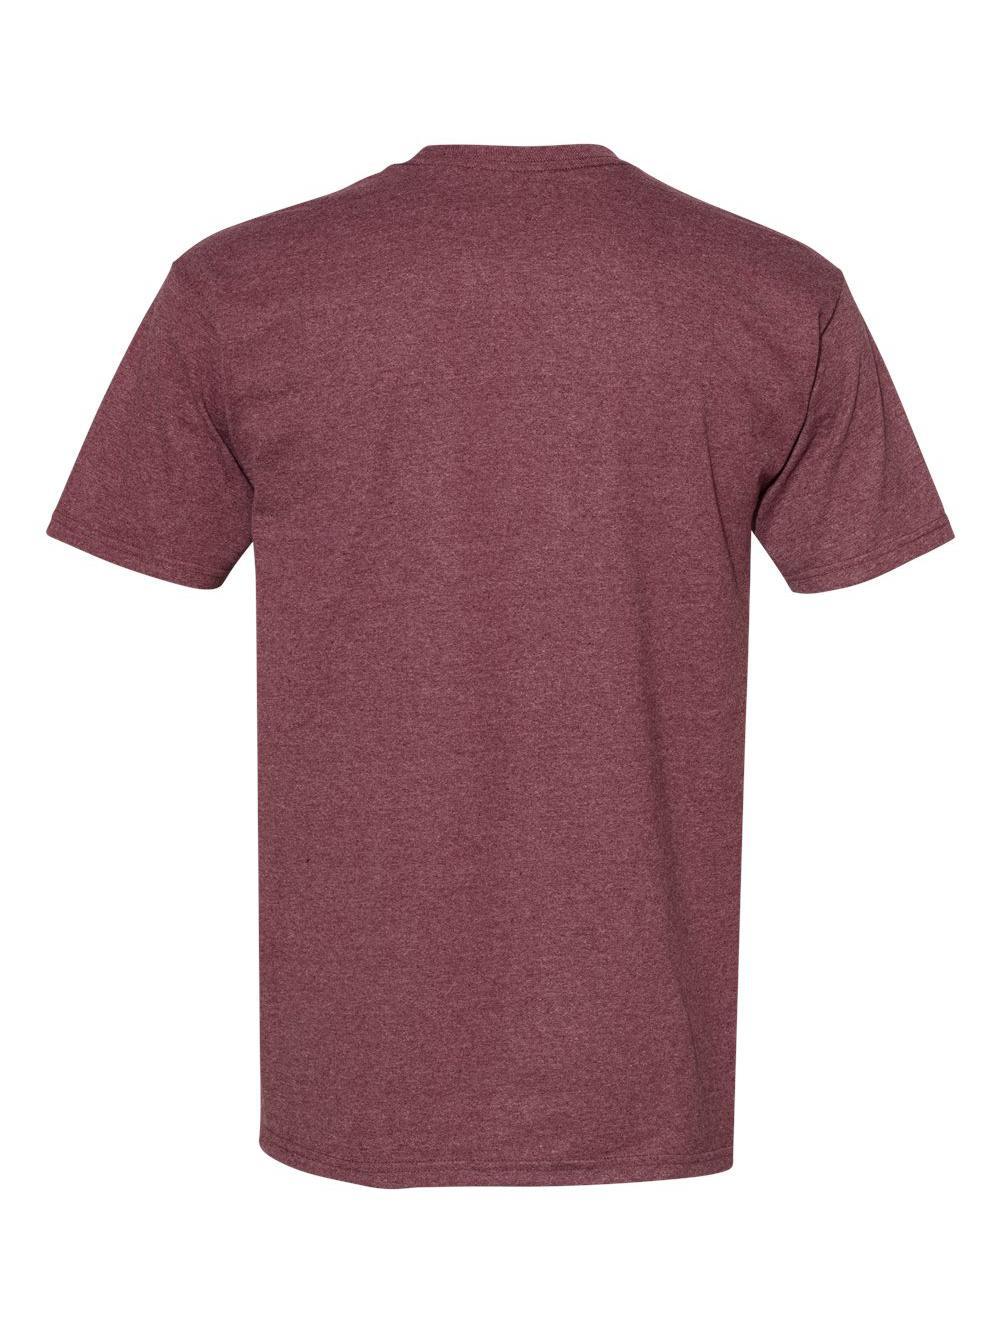 ALSTYLE-Premium-T-Shirt-1701 thumbnail 16